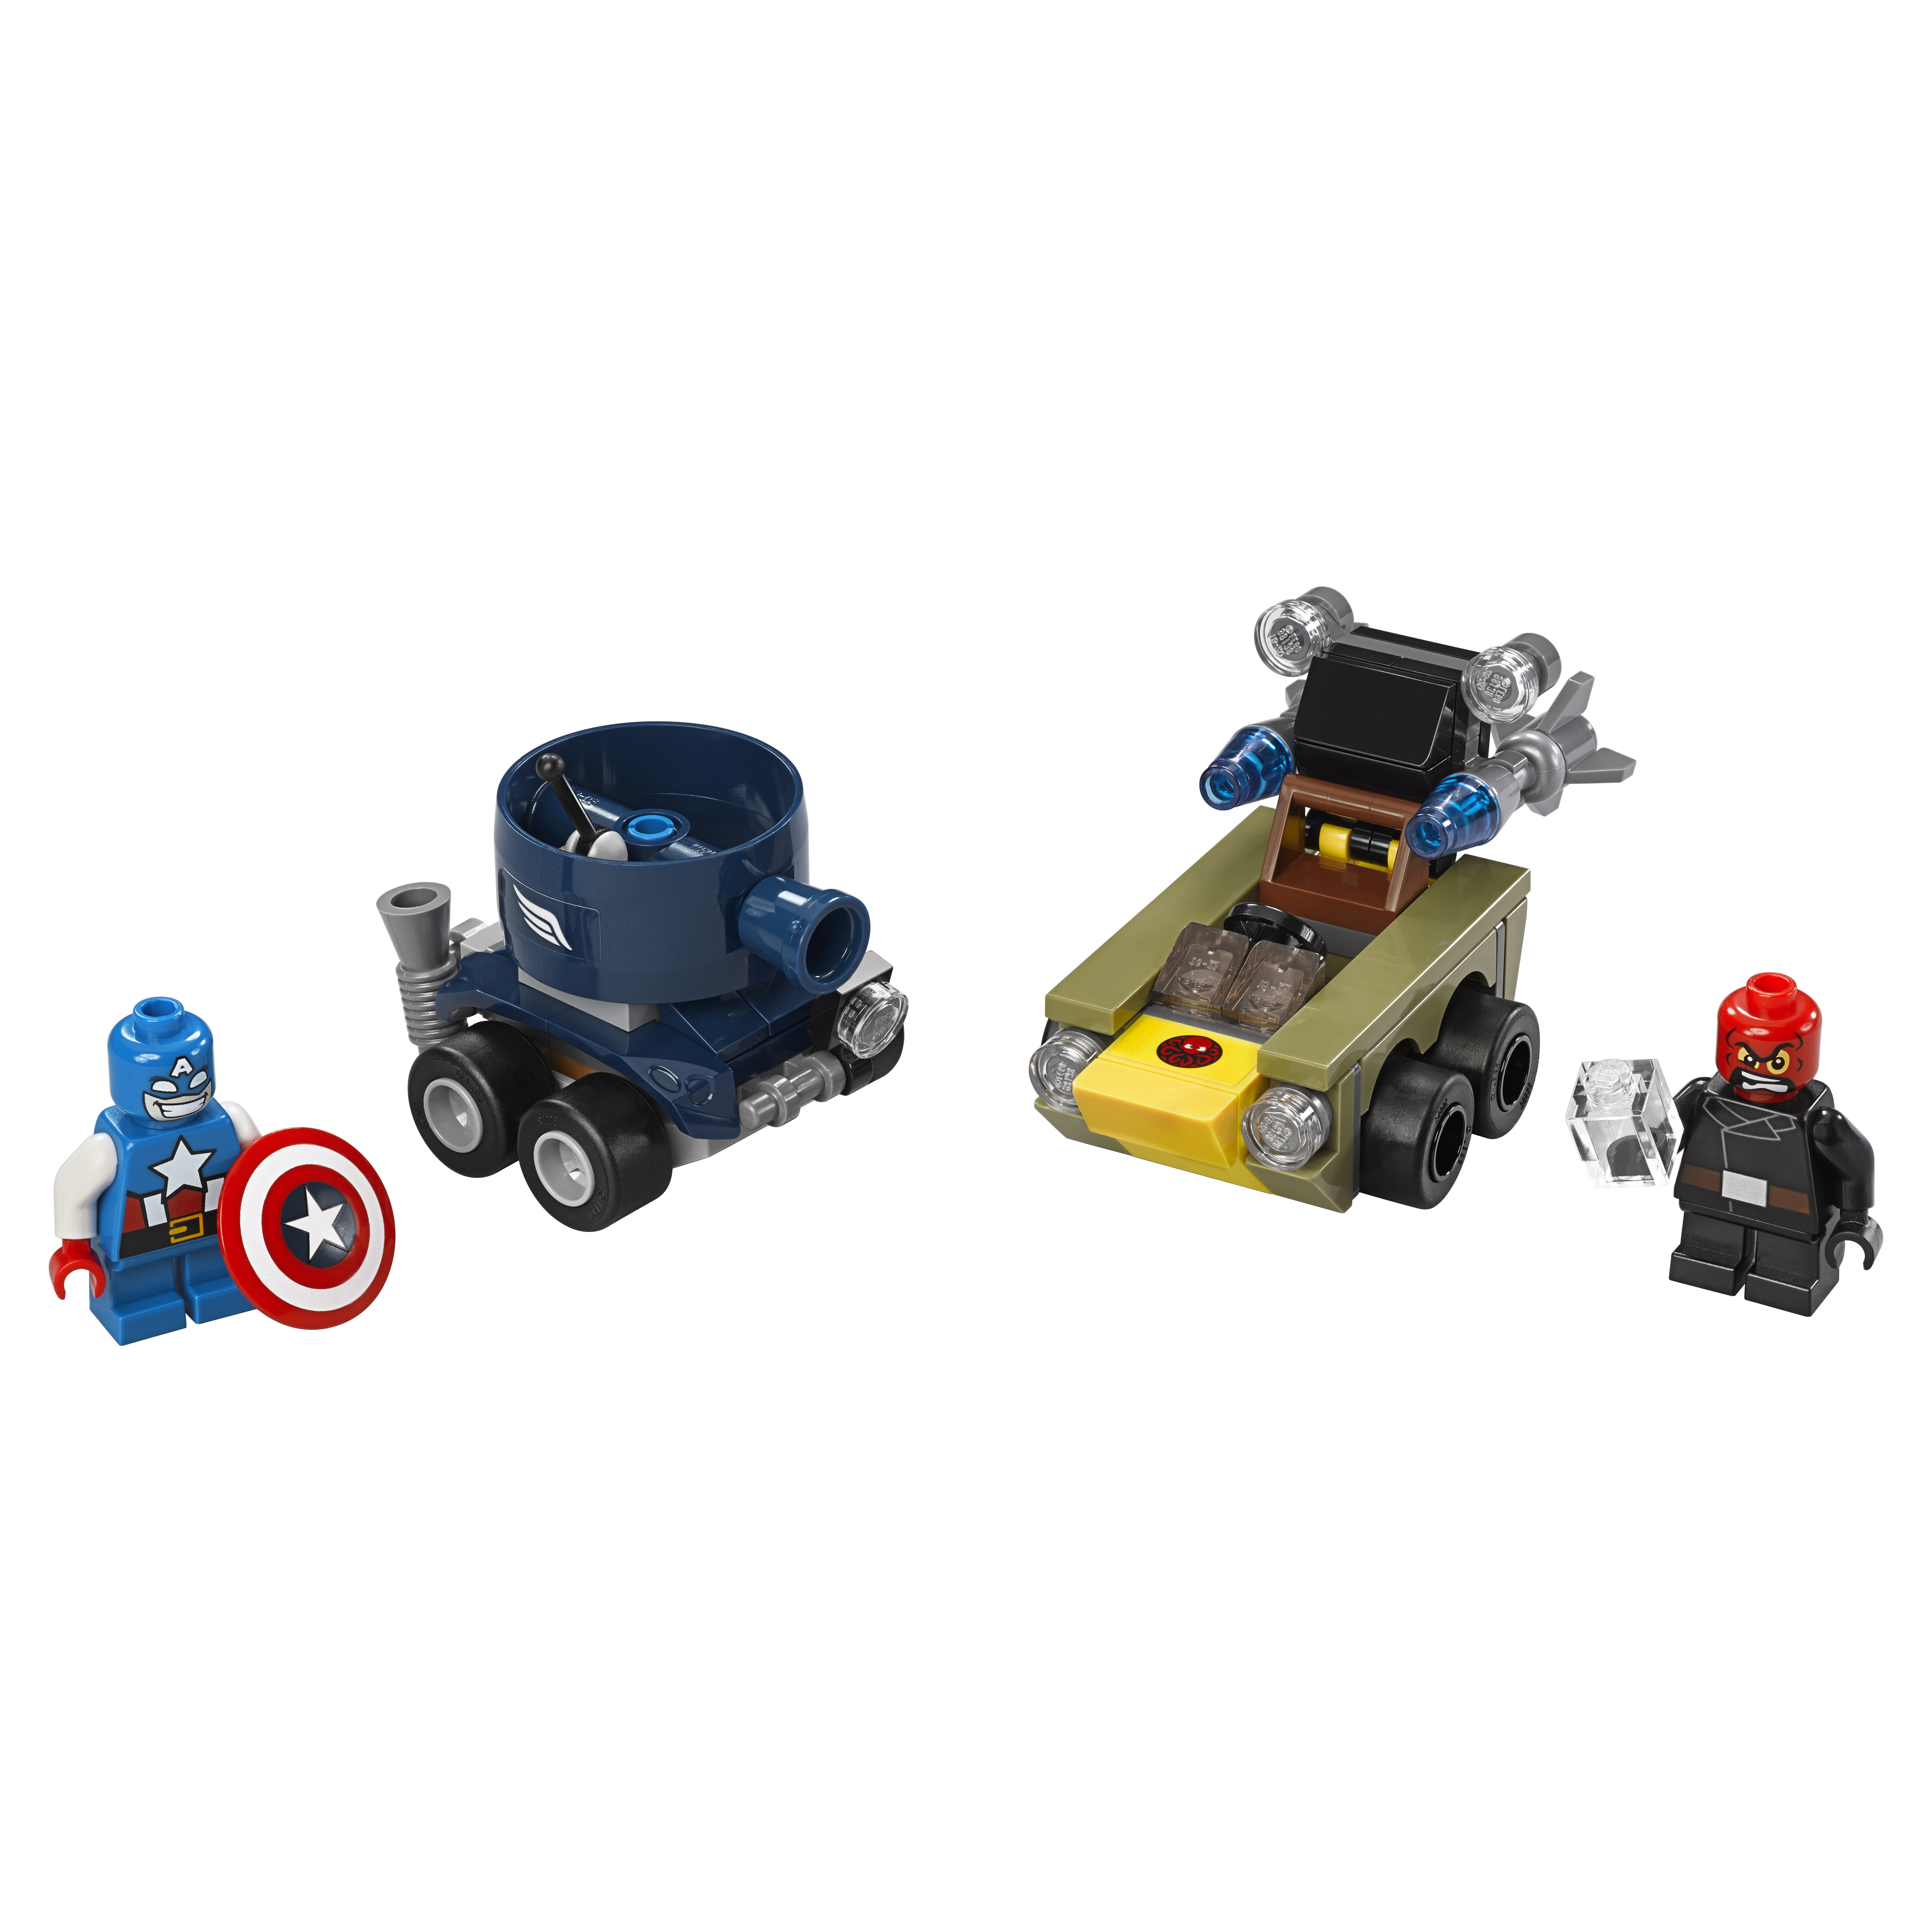 Конструктор LEGO Super Heroes Капитан Америка против Красного Черепа (76065)